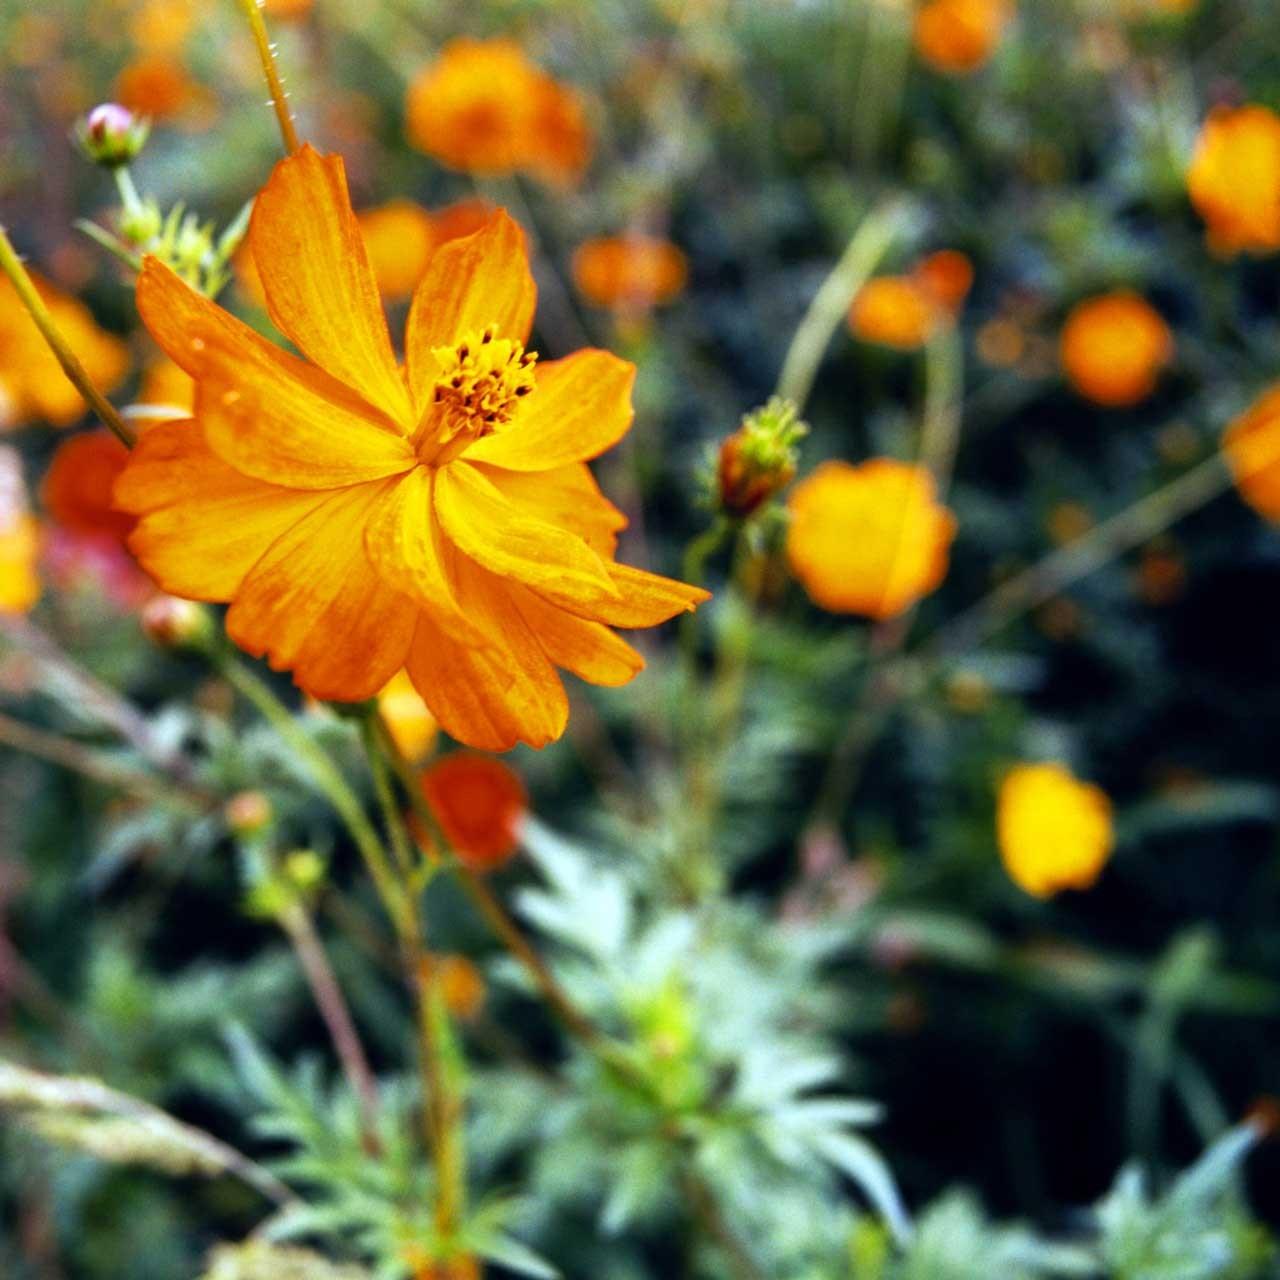 Laure-Maud_photographe_jardin-fleurs_cosmos-1